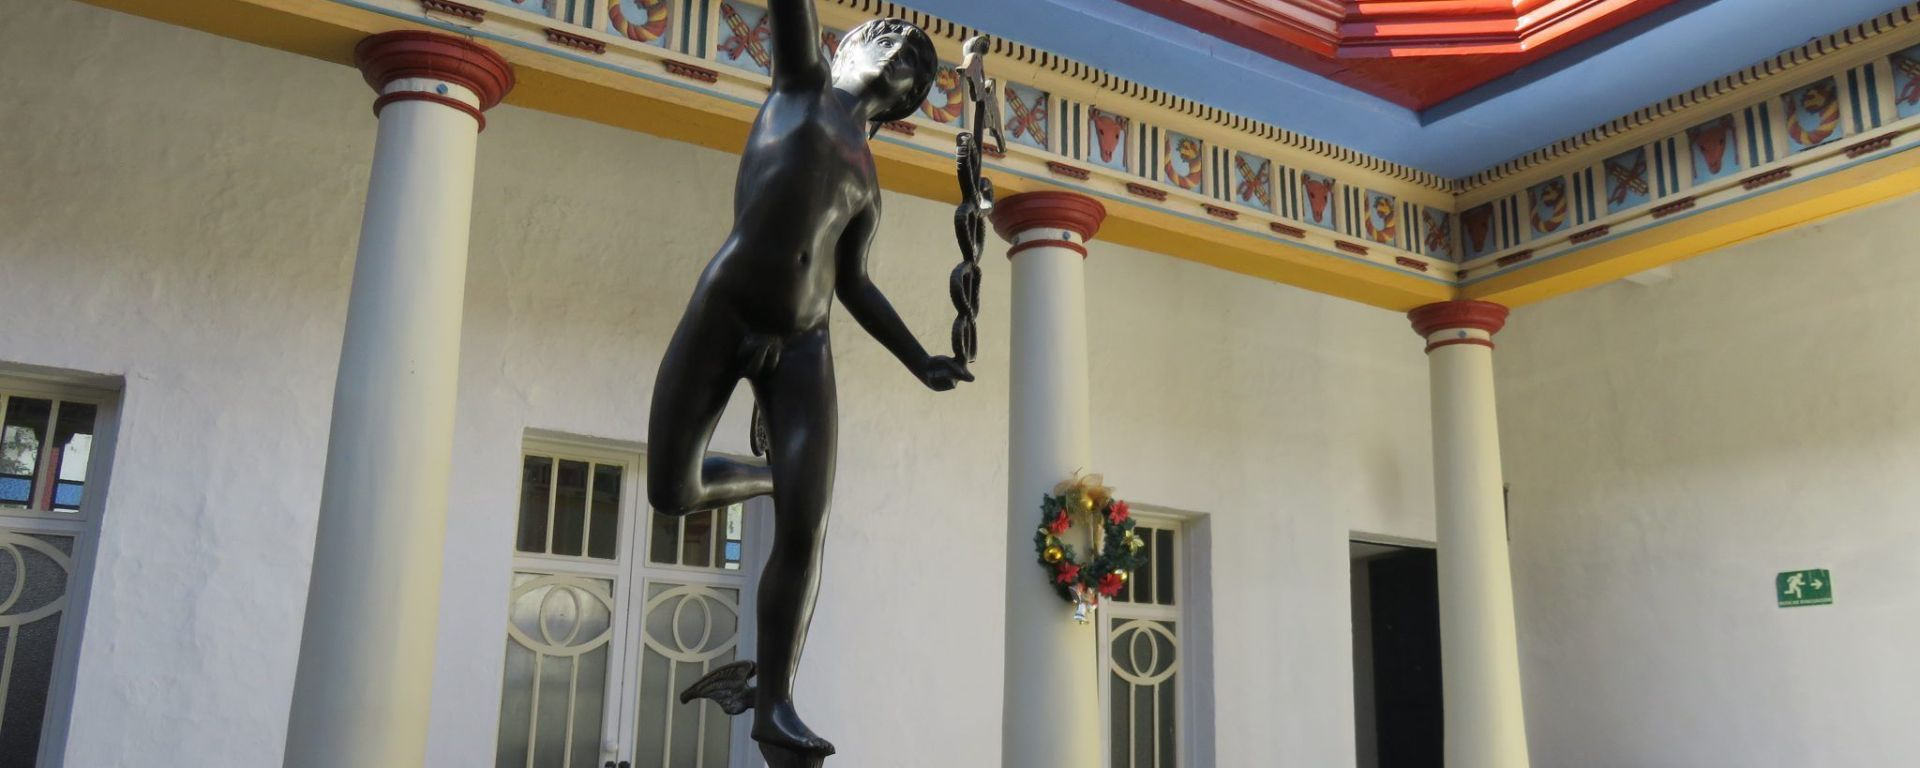 Hermes, Popayán, Colombia